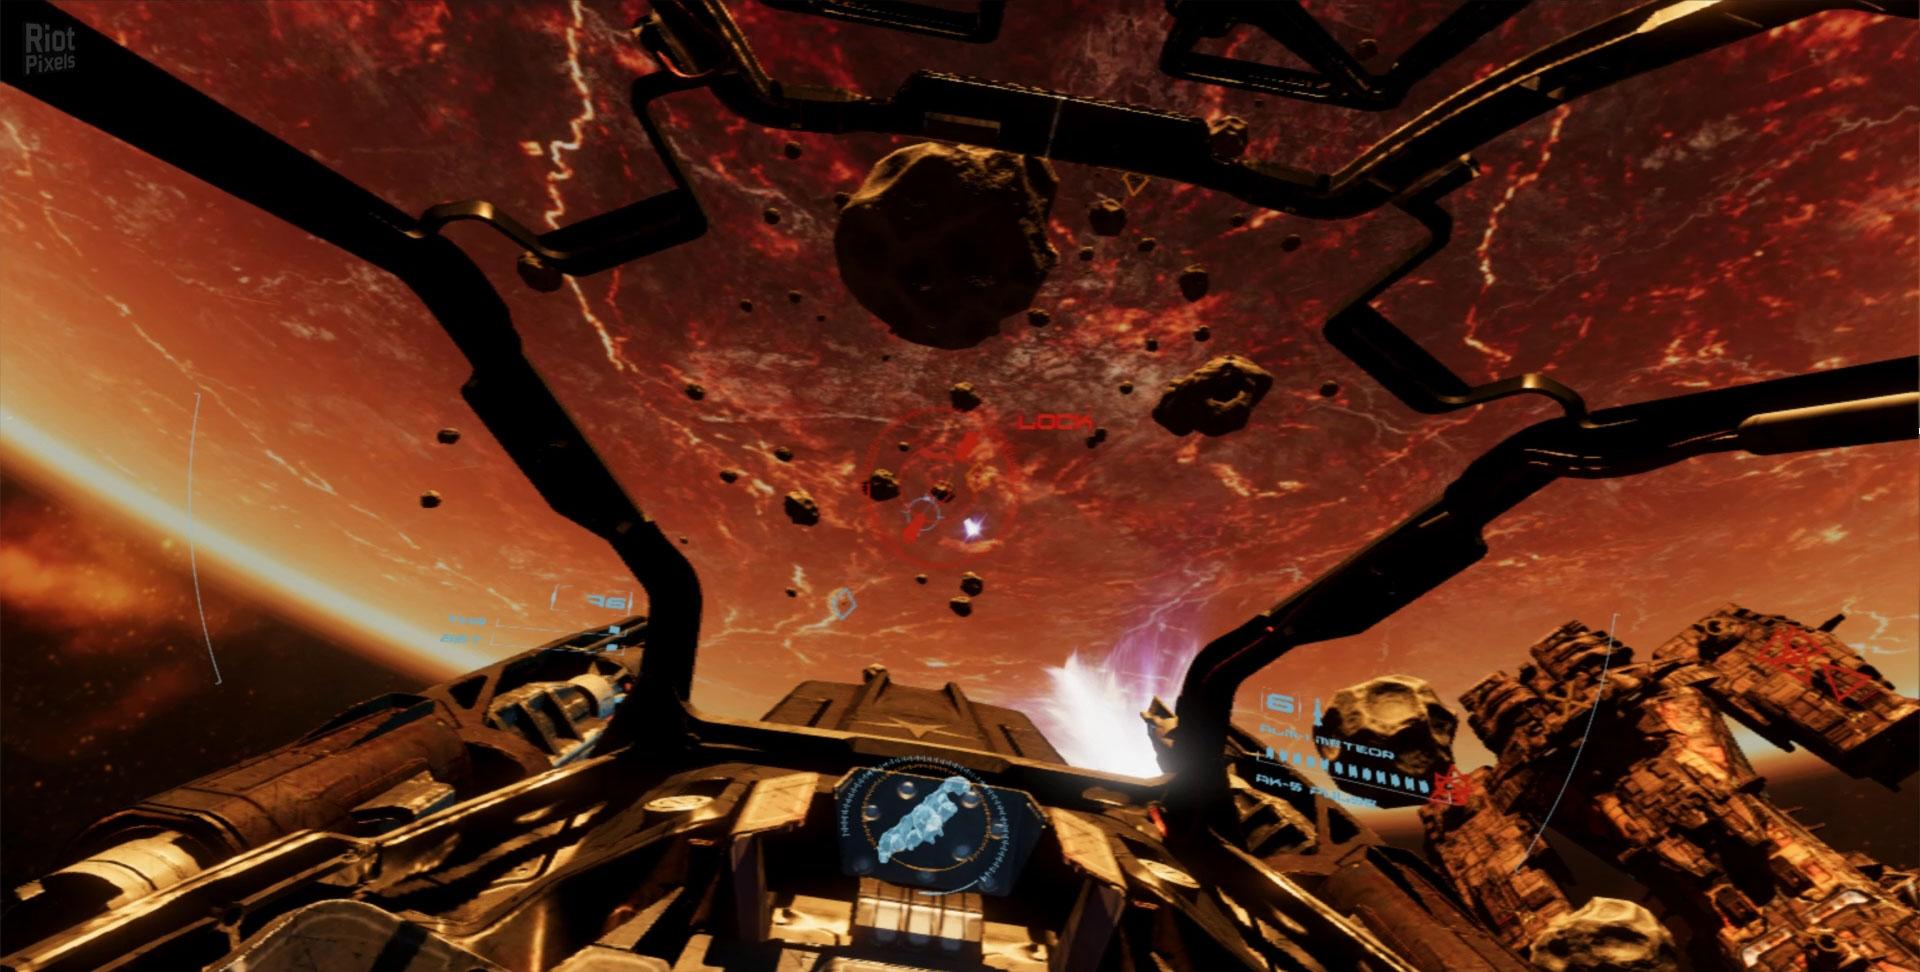 End Space VR - game screenshots at Riot Pixels, images